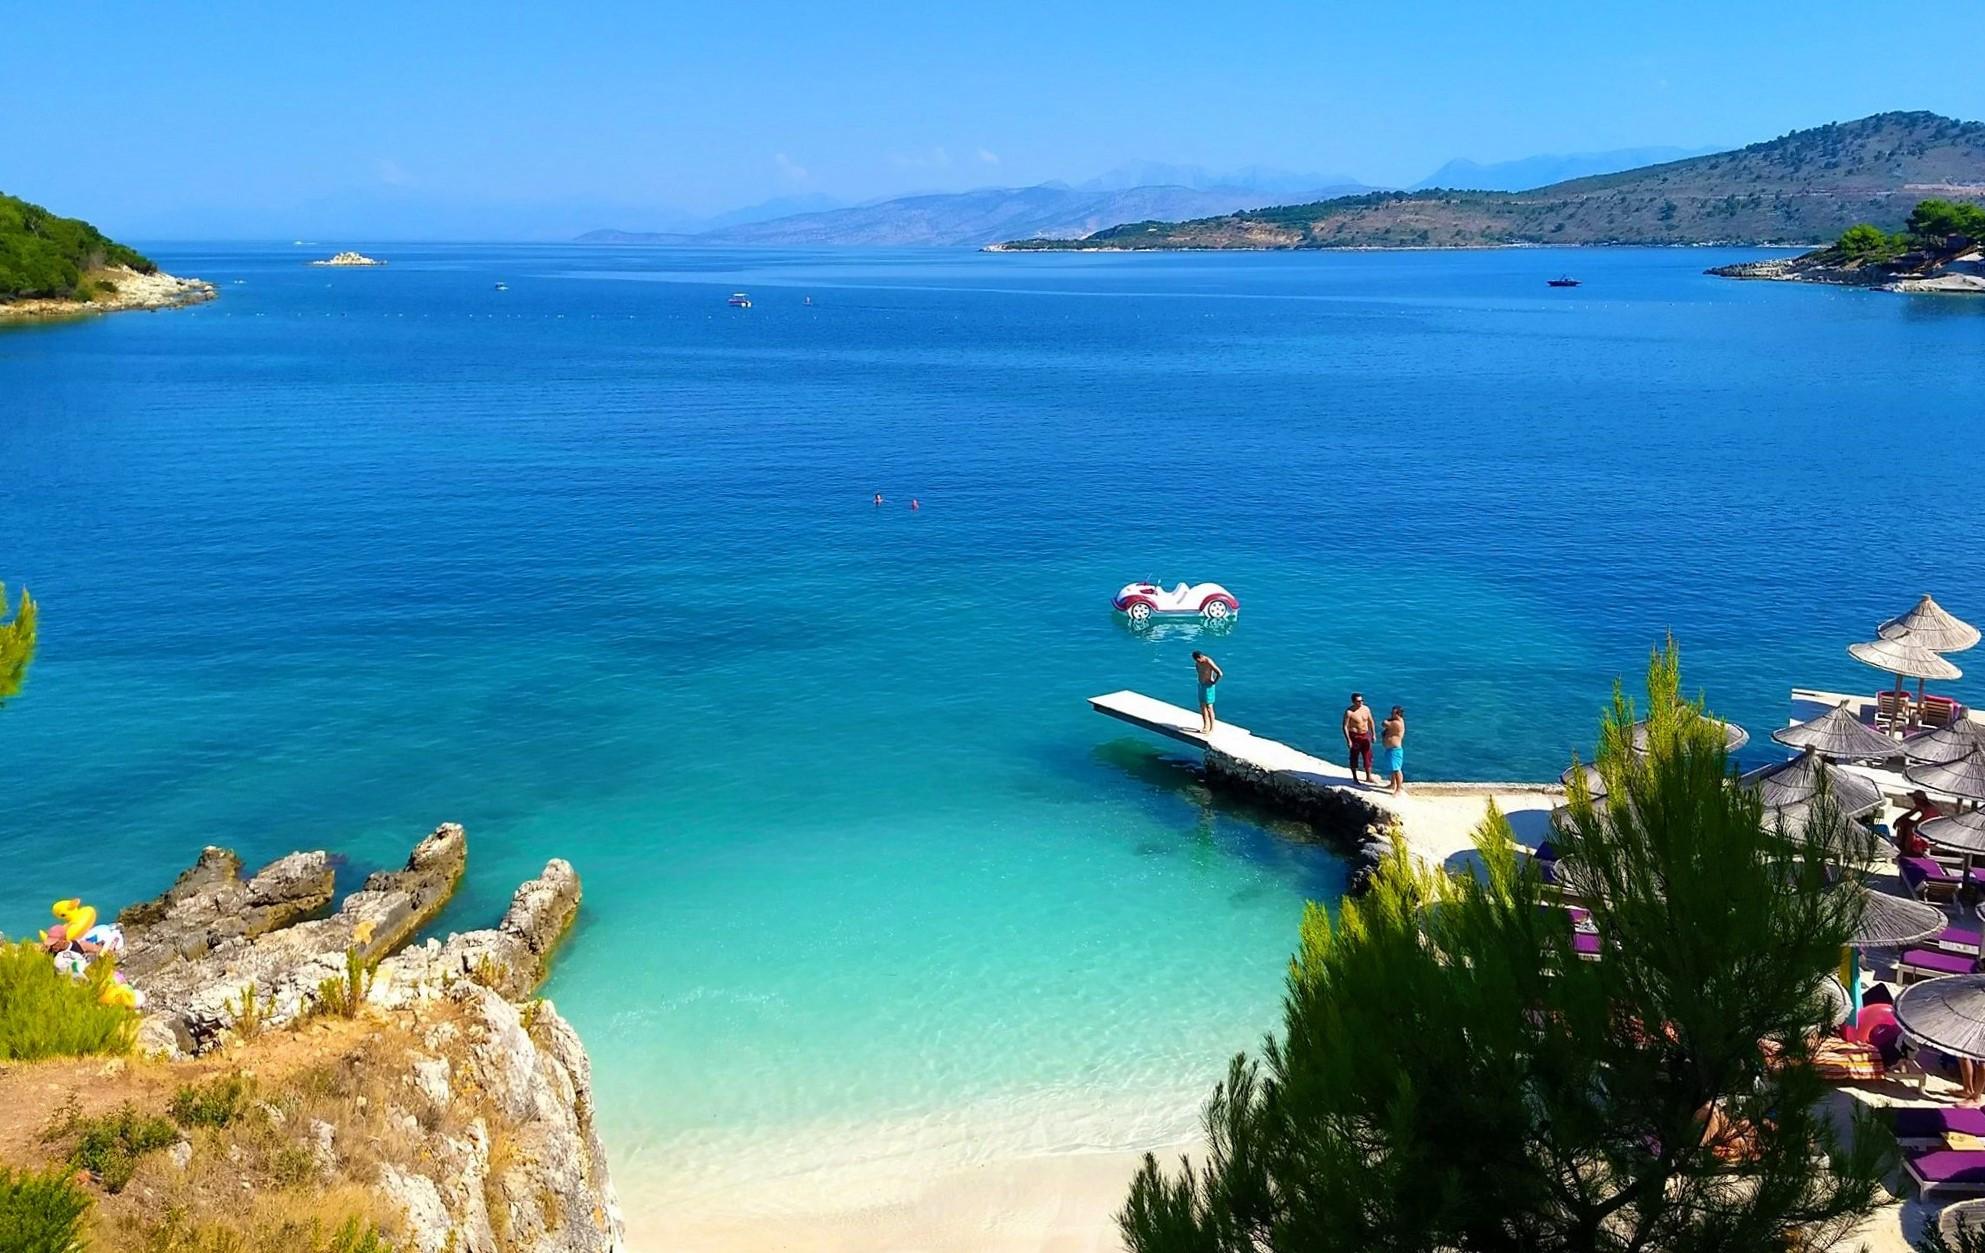 Ksamili beaches - best beaches of Albania